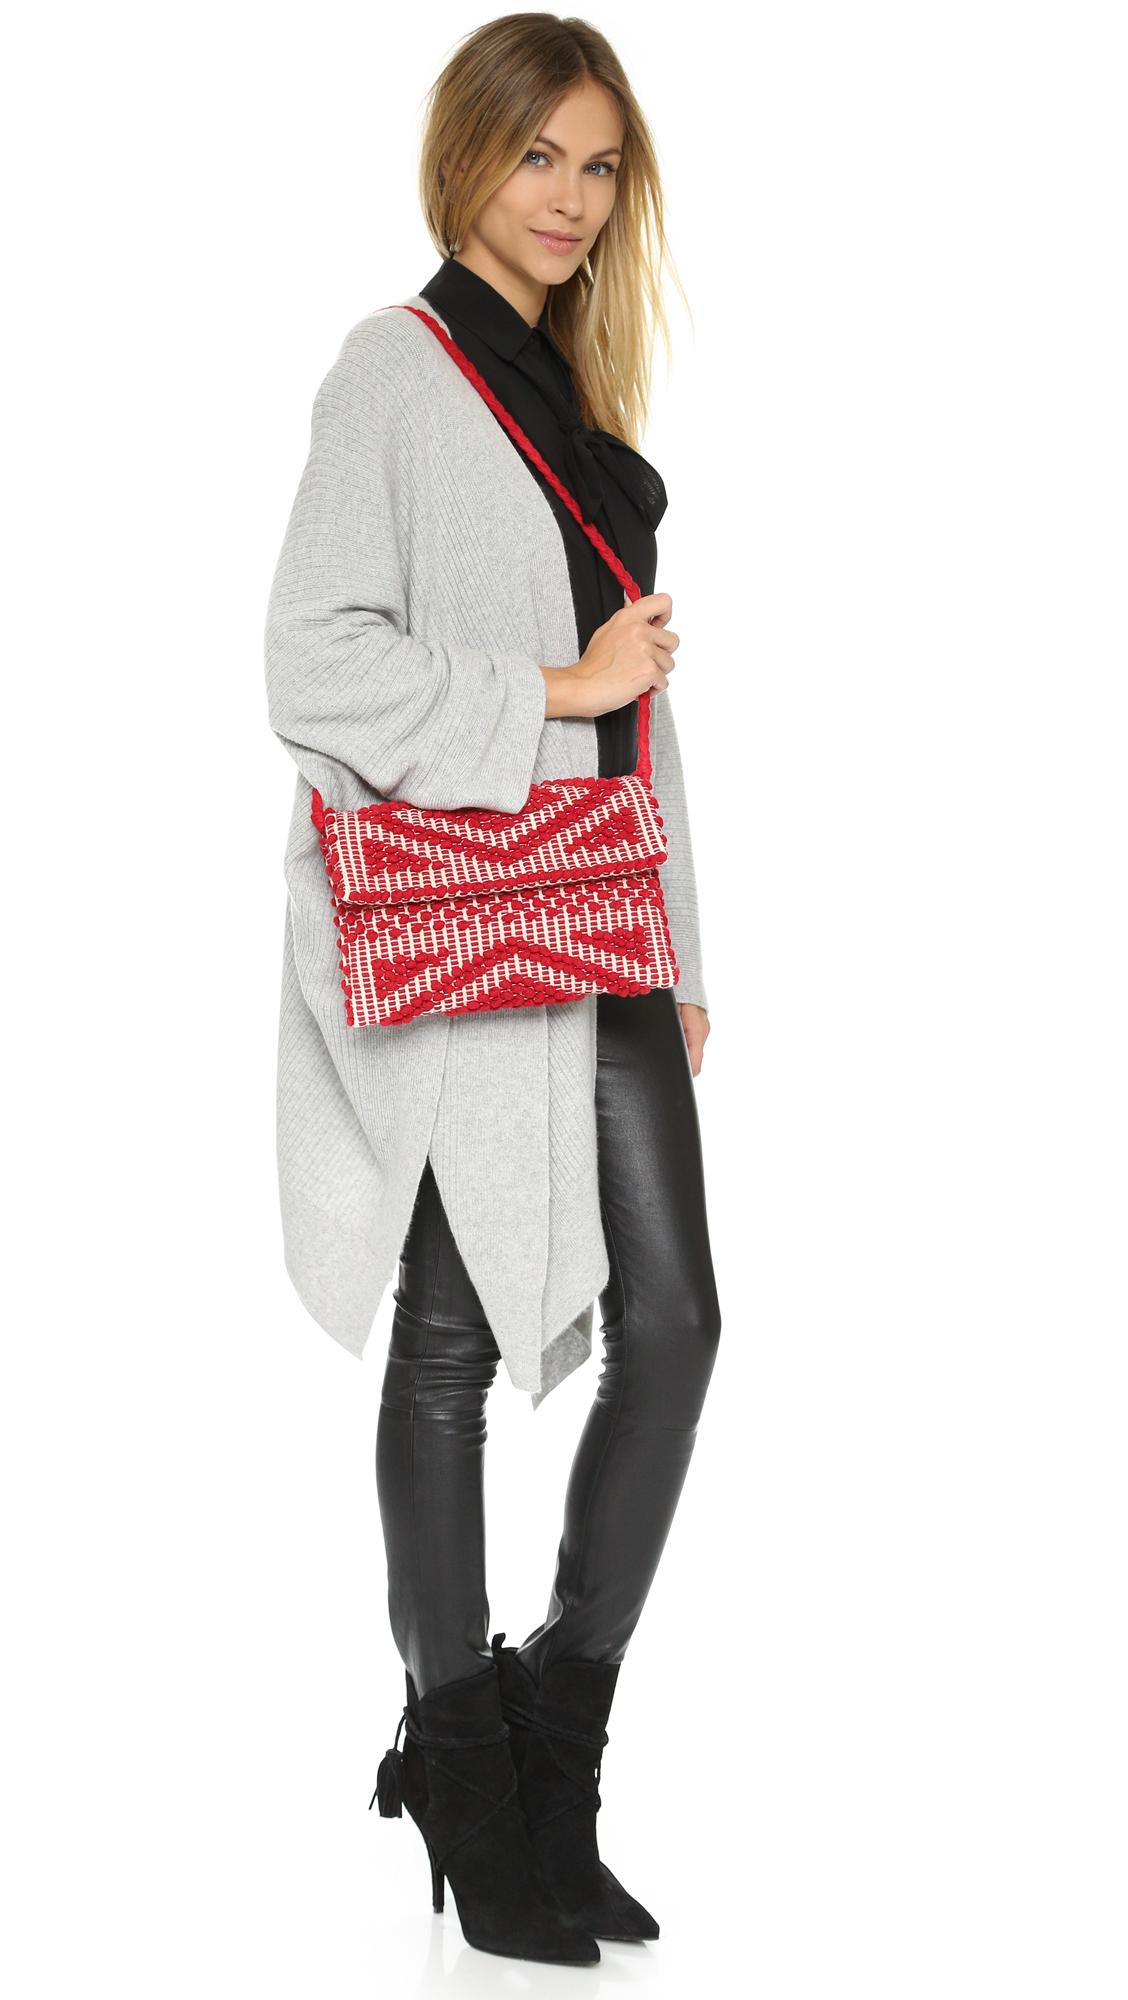 Antonello Suni Cross Body Bag in Red/Ivory (Red)